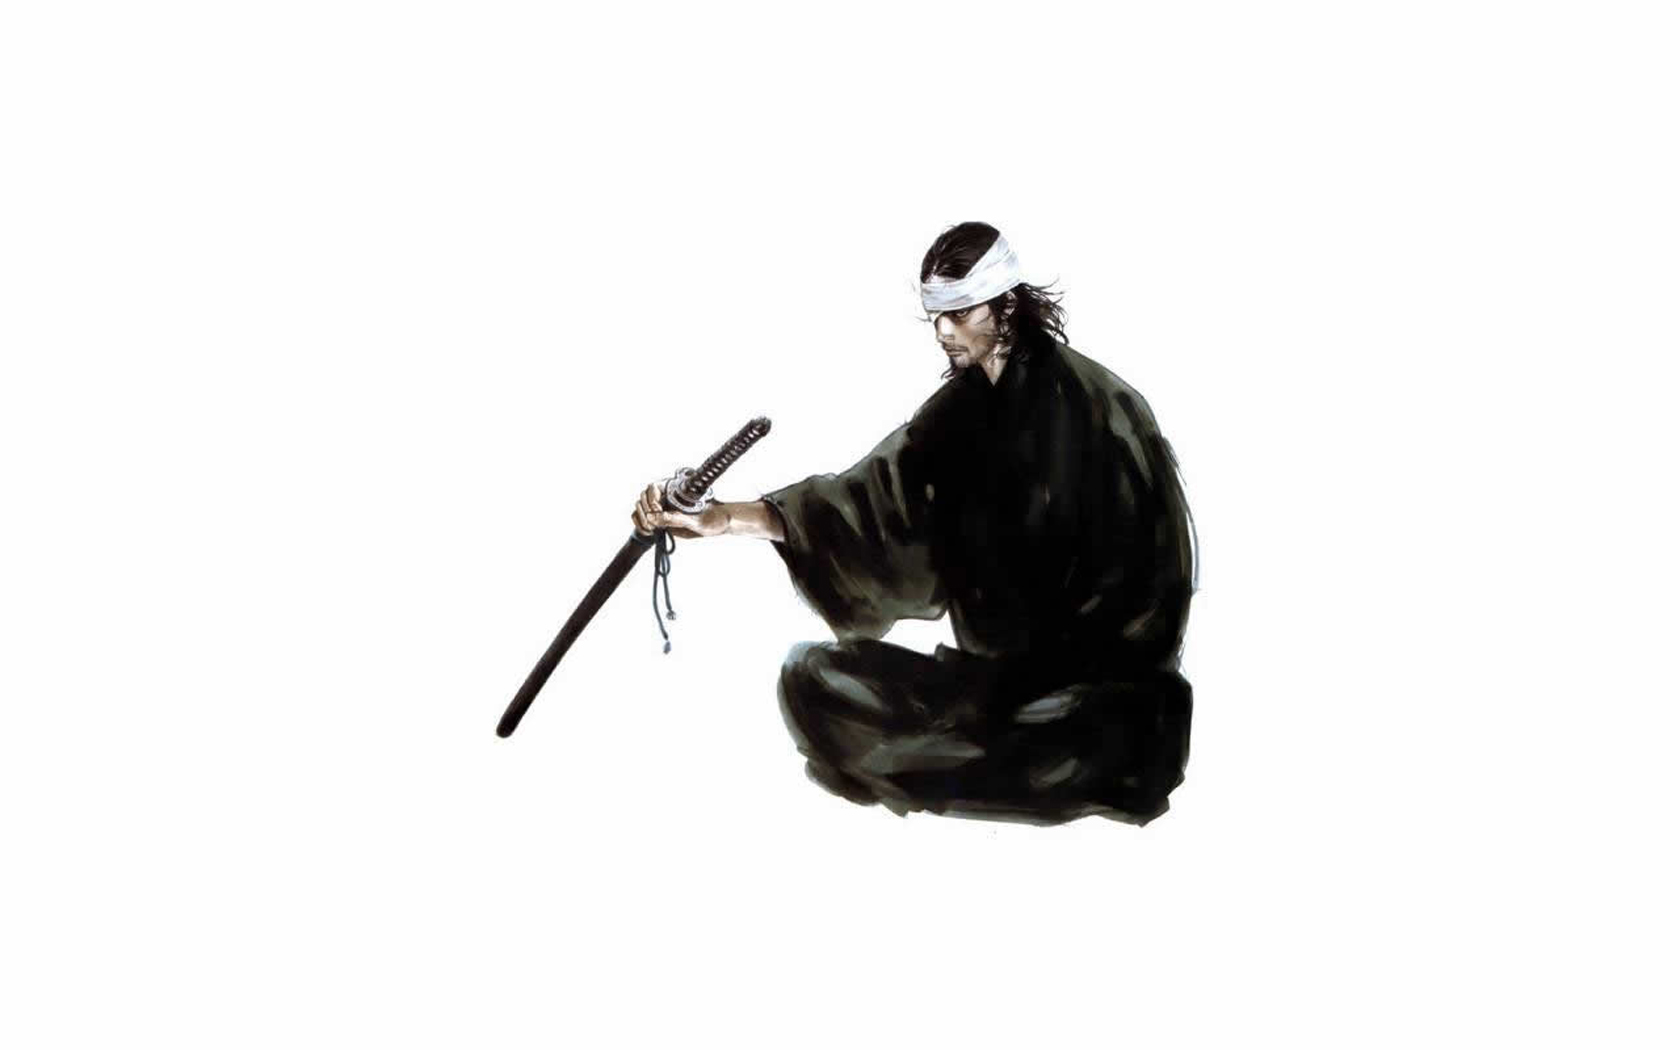 vagabond, anime, sword wallpapers hd / desktop and mobile backgrounds